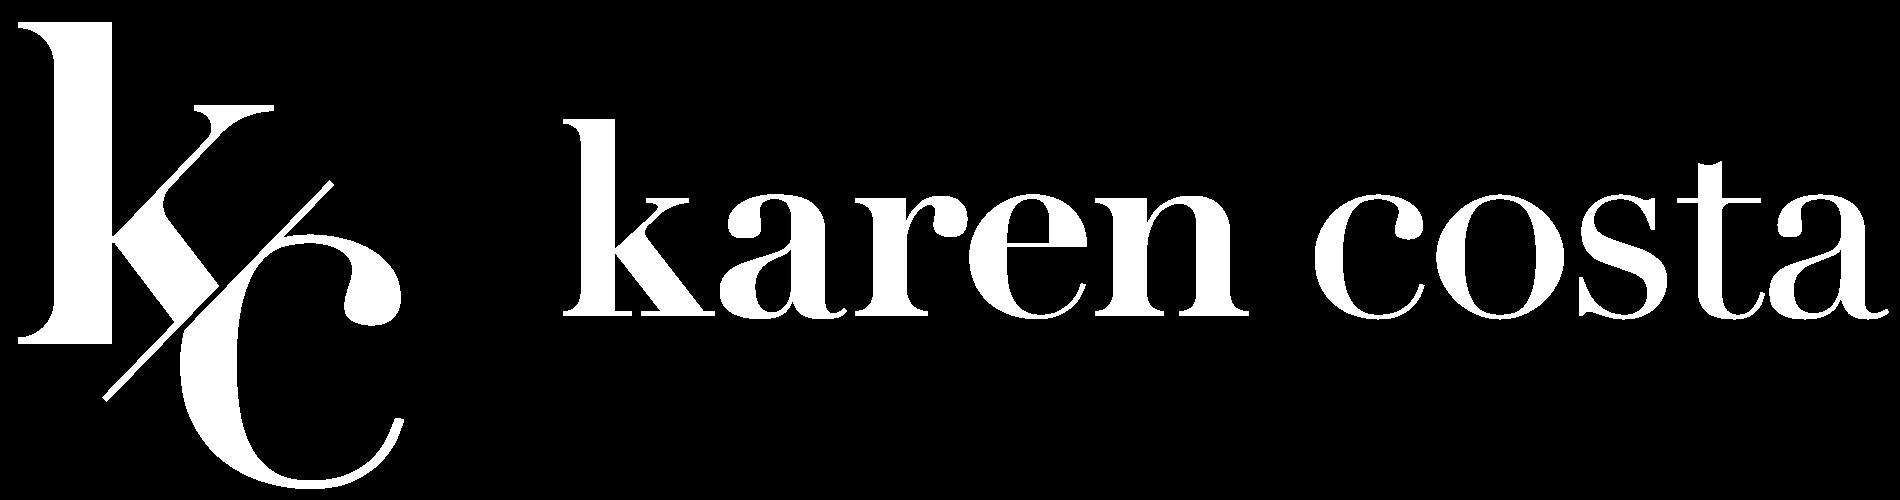 Karen Costa Real Estate Logo